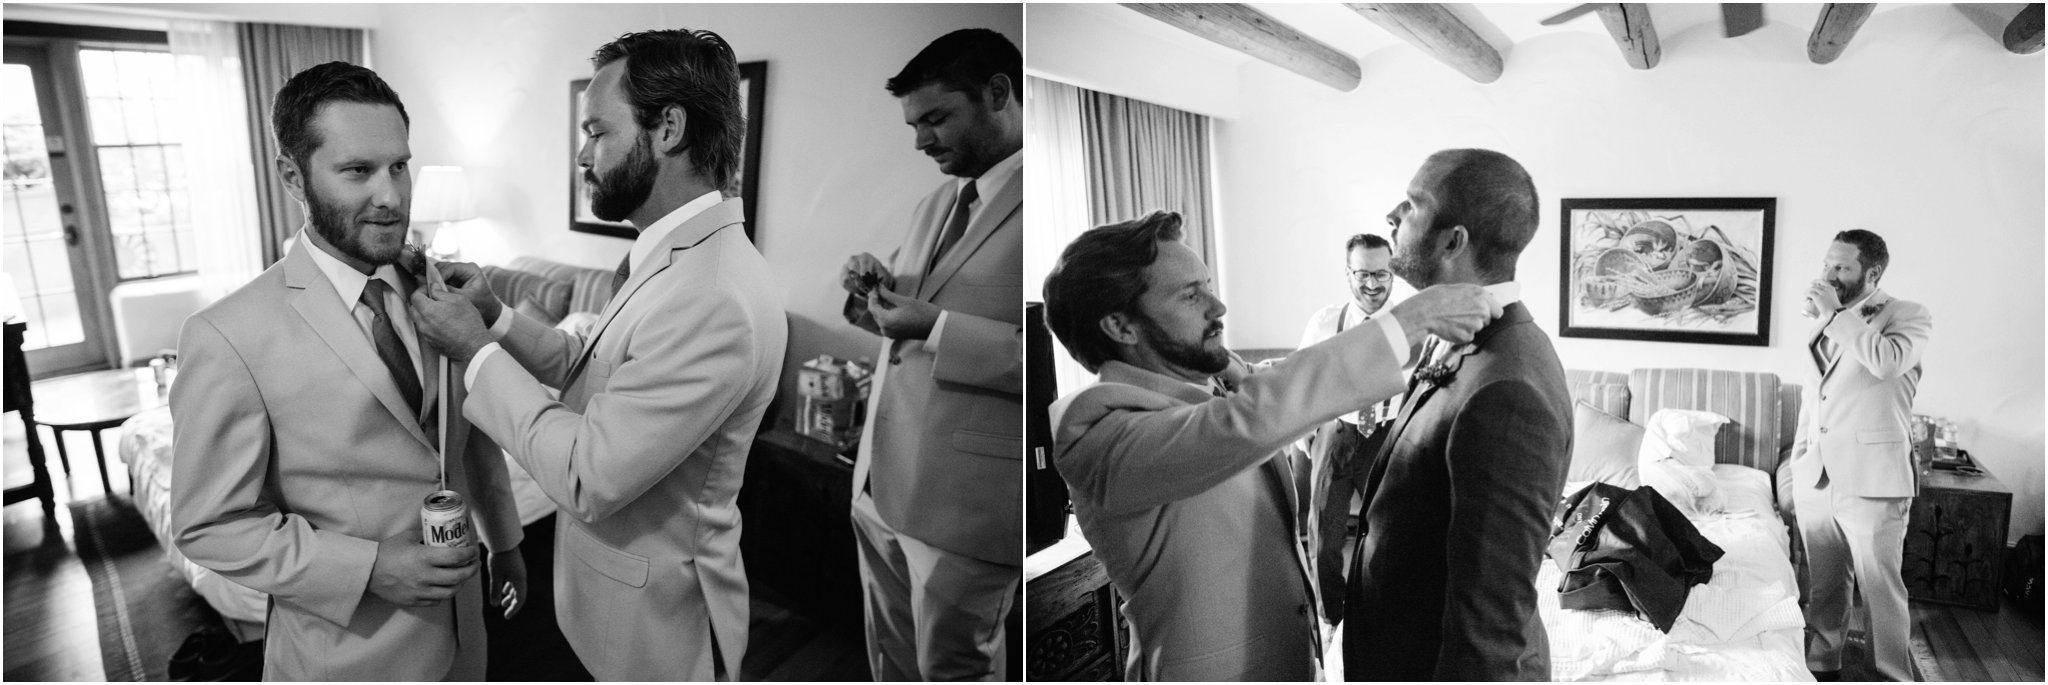 0014albuquerque-wedding-photographer_-santa-fe-wedding-photographer_-southwest-wedding-photography_-blue-rose-studio